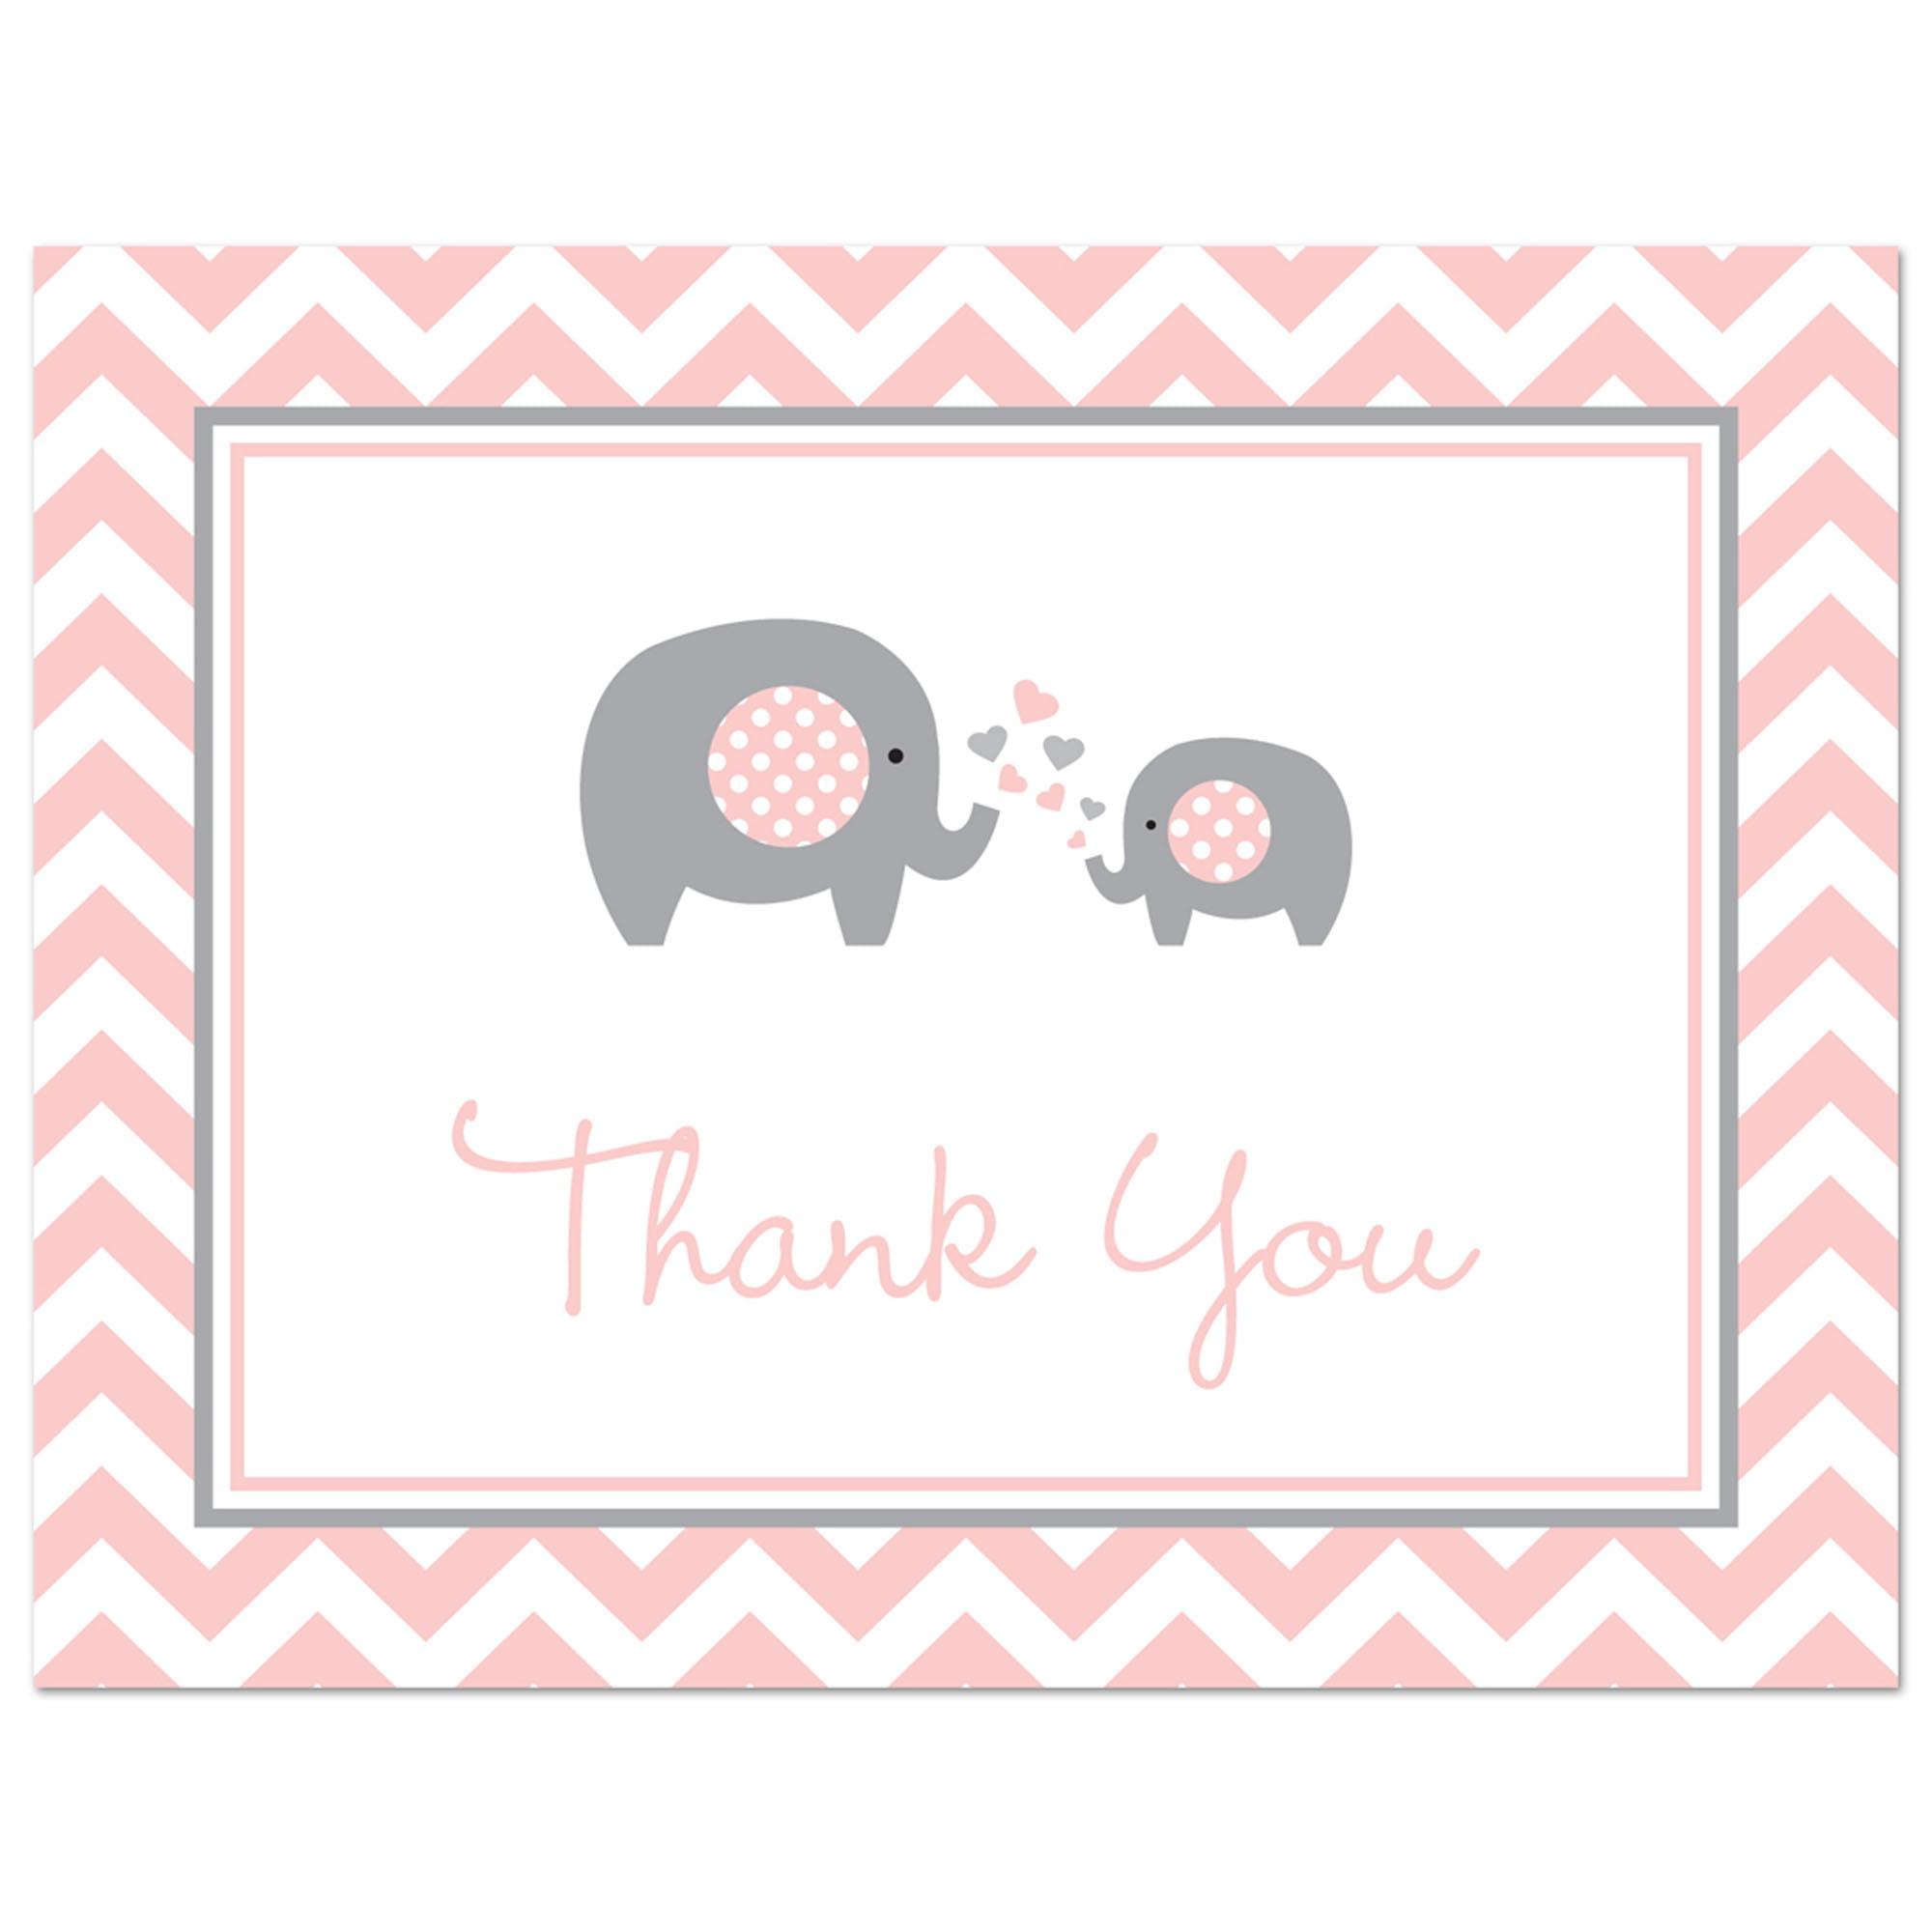 babyshower thank you card